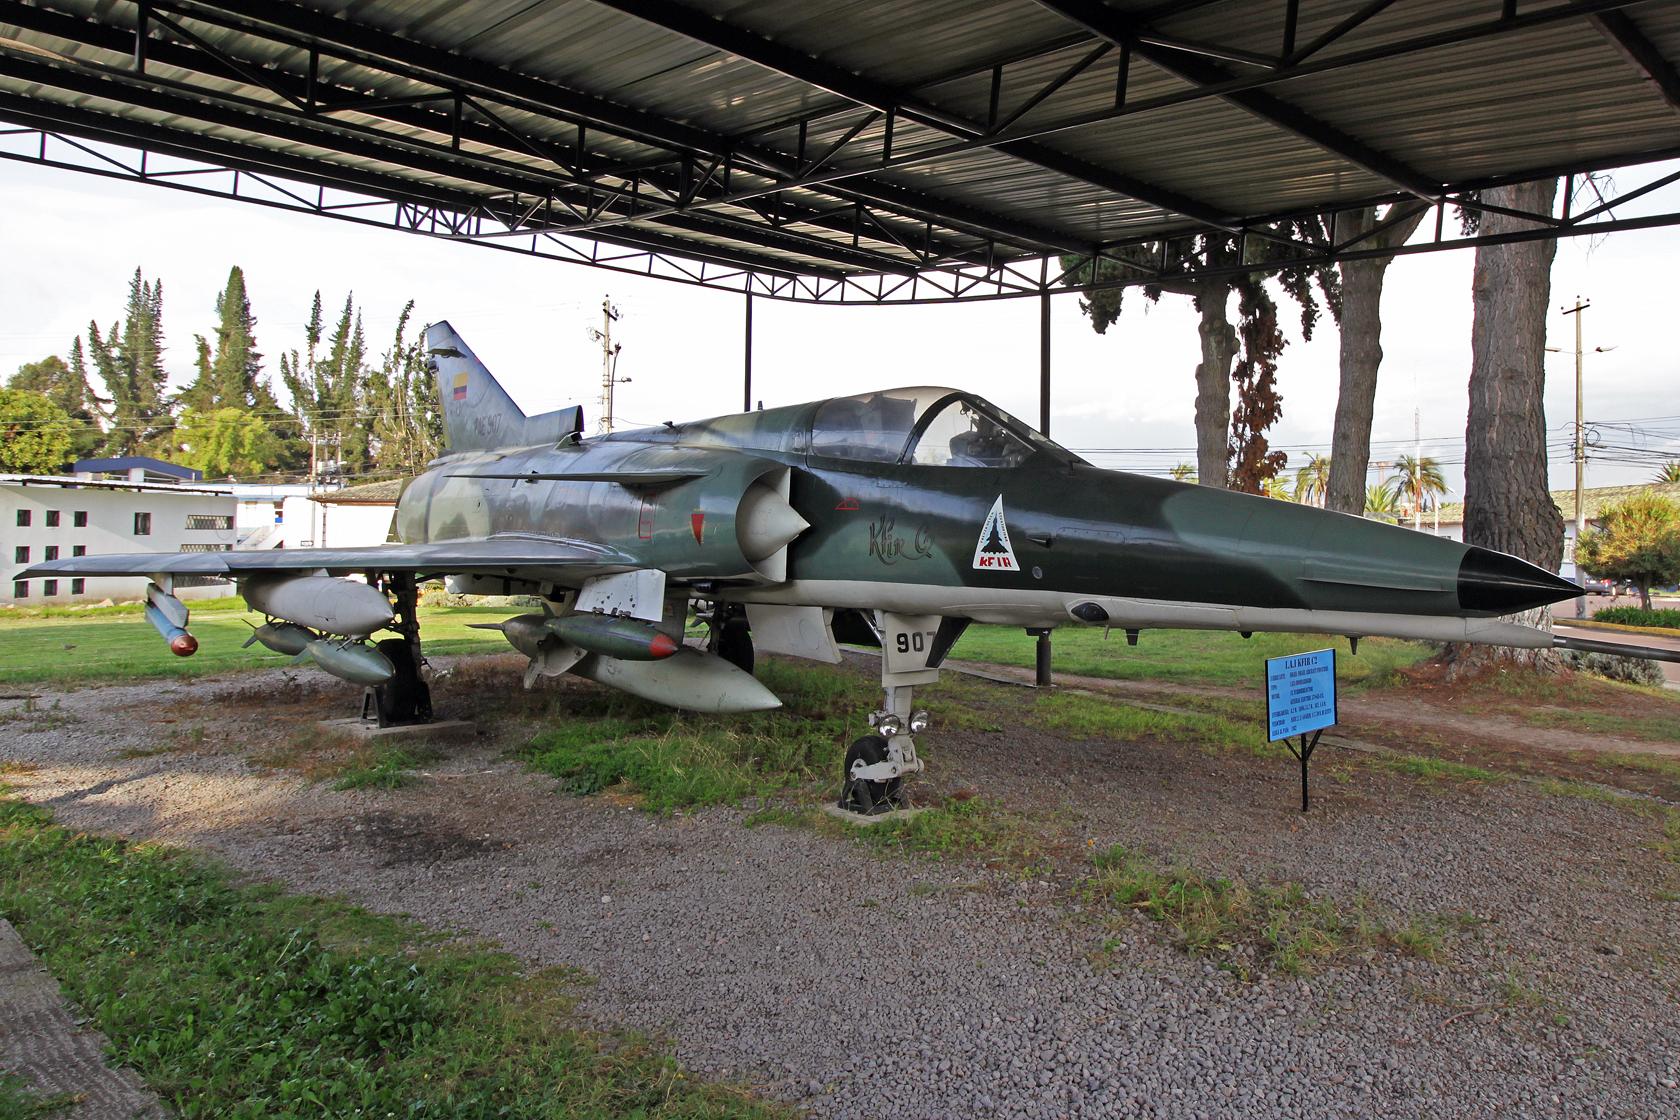 Fuerza Aérea Ecuatoriana IAI Kfir C2 FAE-907